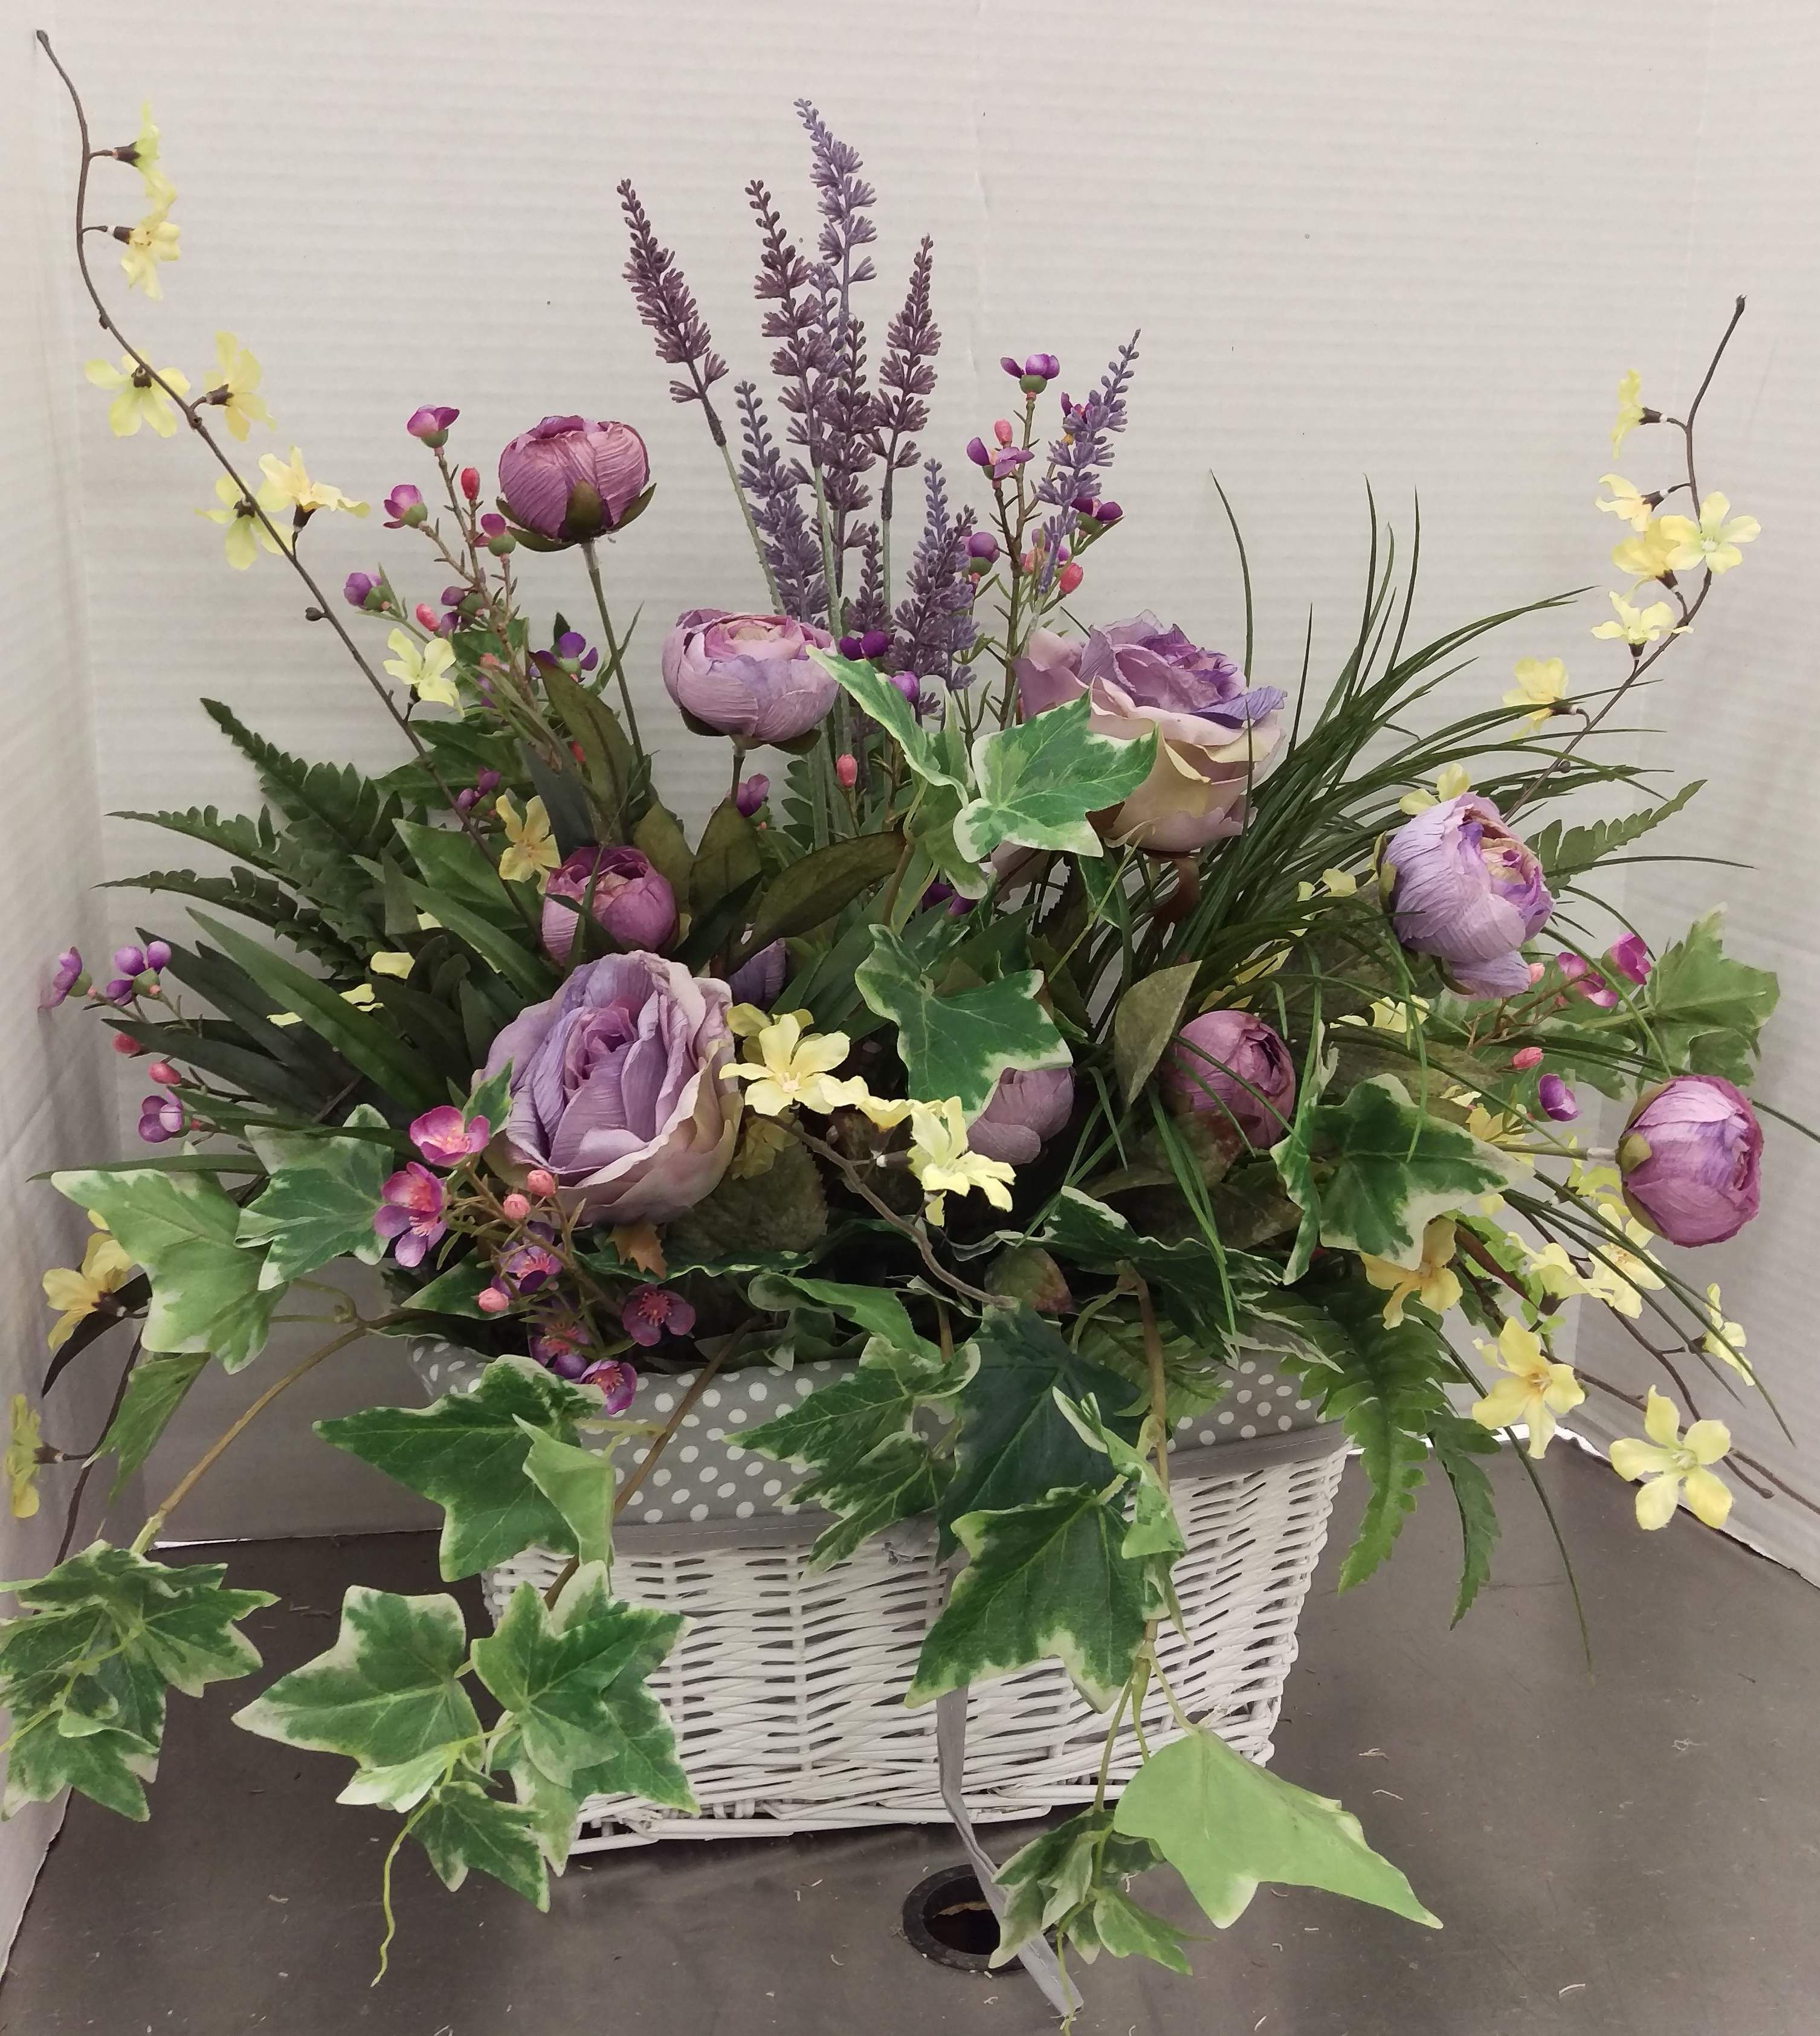 Spring 2017 By Randi Sheldon At Michaels 1600 In 2020 Artificial Flower Arrangements Summer Flower Arrangements Fresh Flowers Arrangements